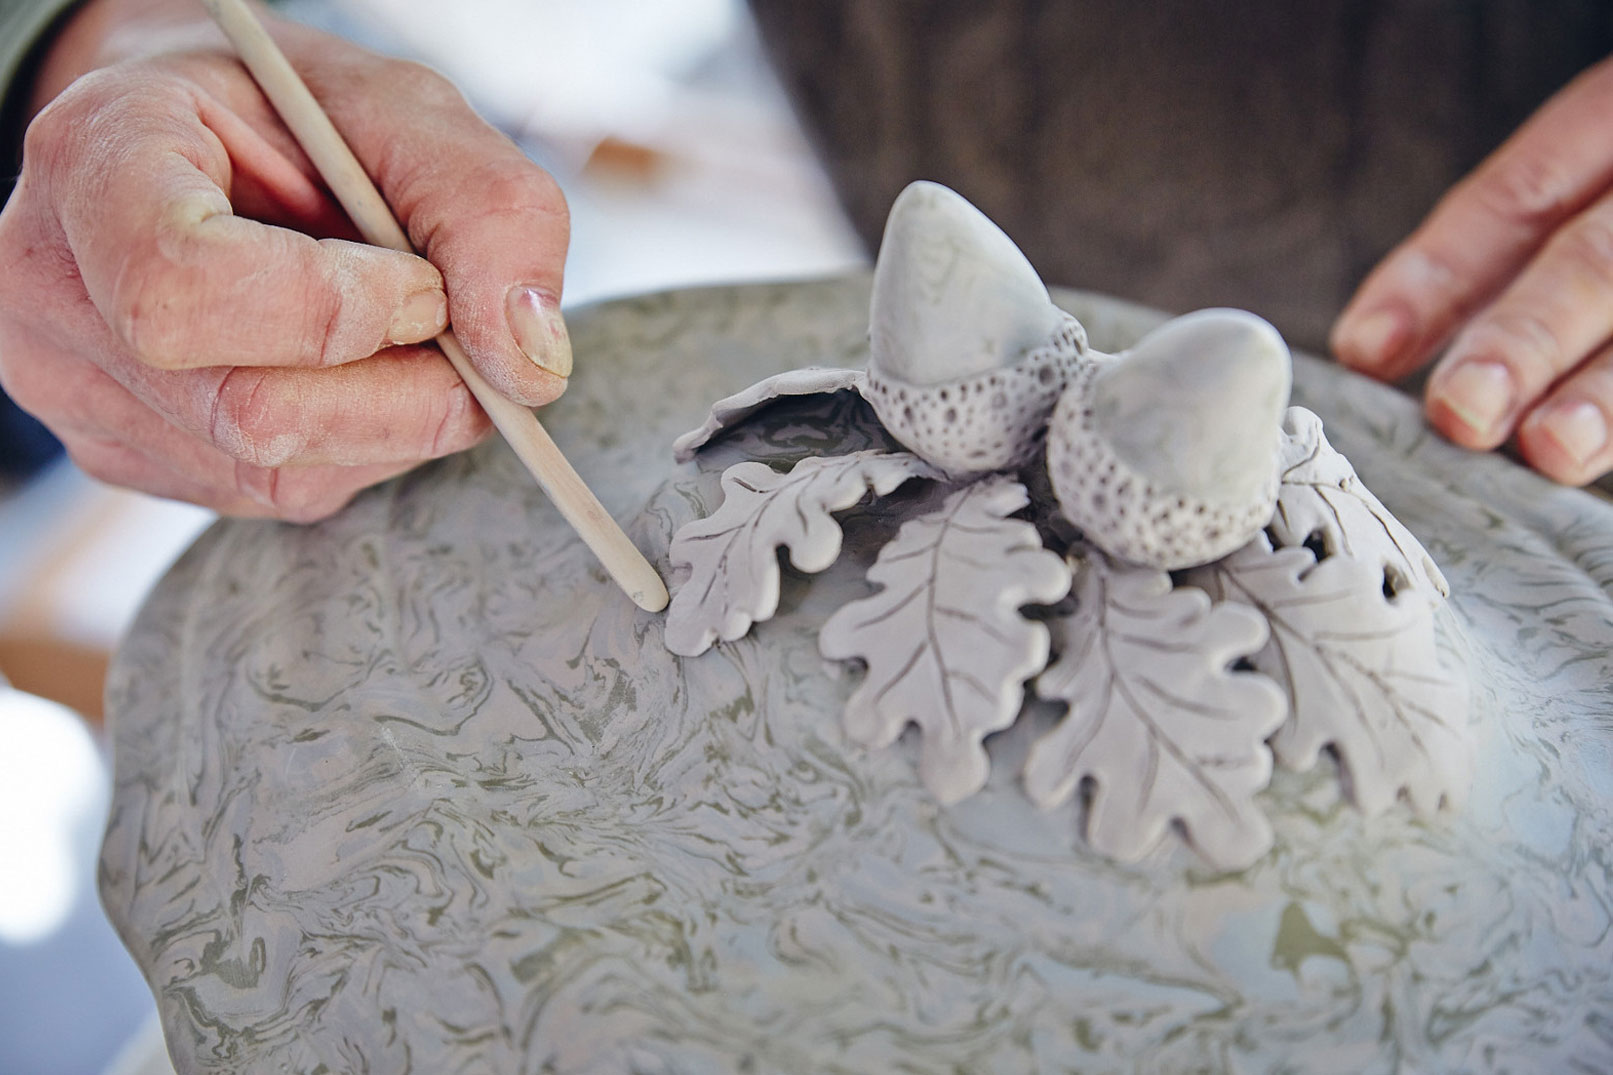 Artes y manualidades – Vaucluse @ Coquard